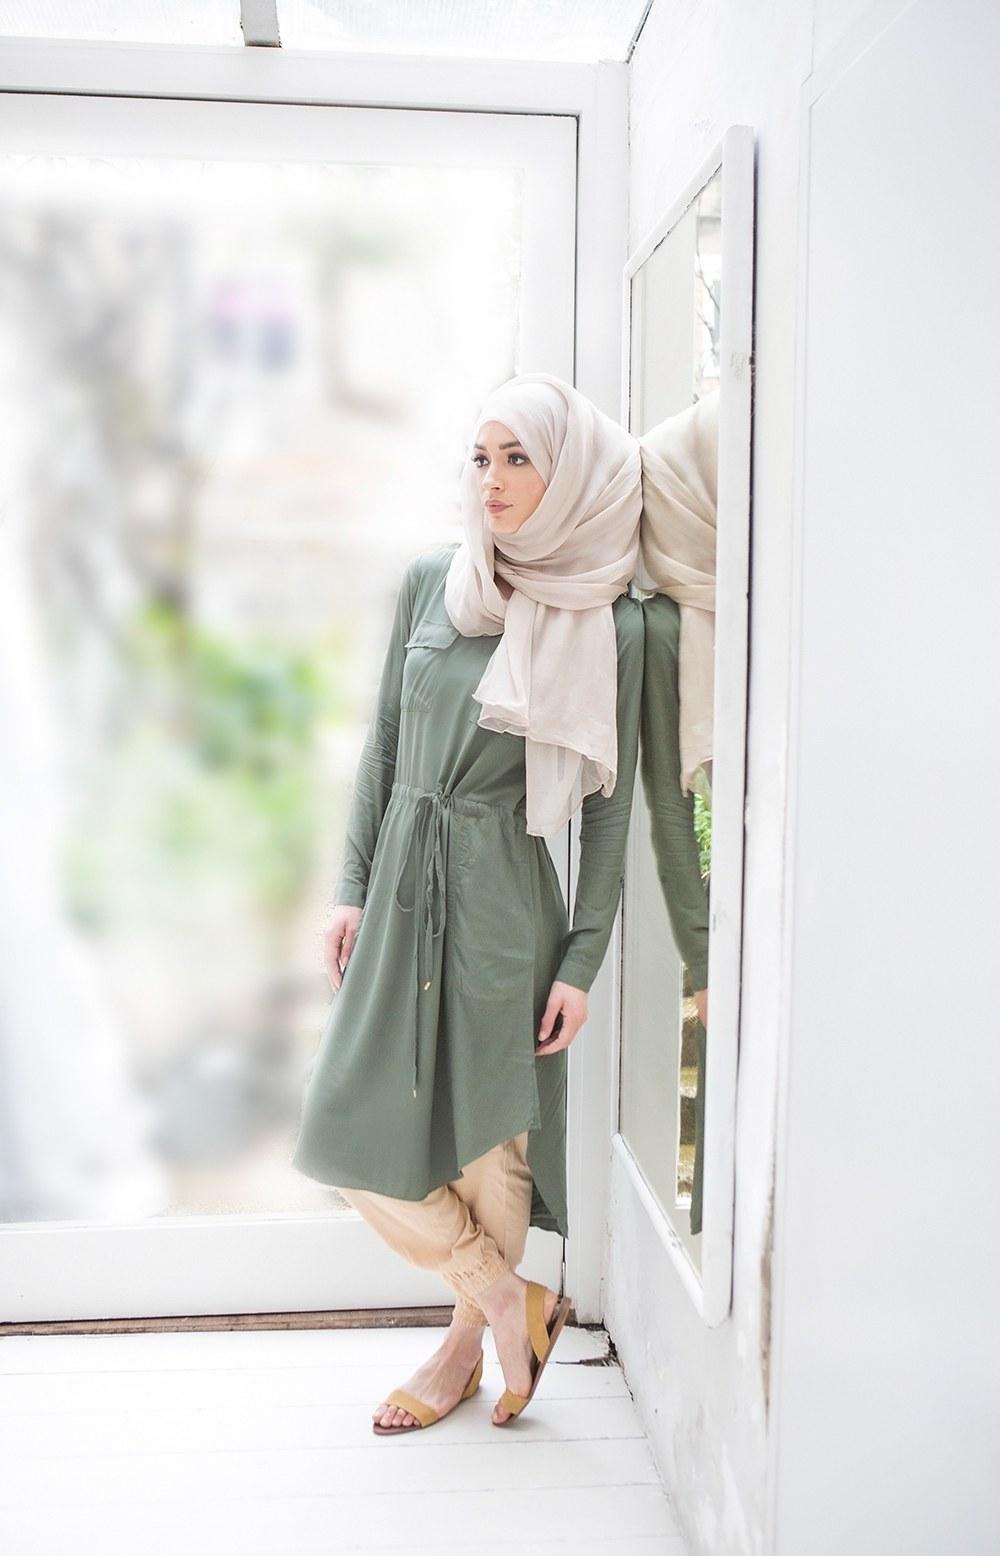 Inspirasi Model Baju Lebaran Syahrini 2017 T8dj 25 Trend Model Baju Muslim Lebaran 2018 Simple & Modis